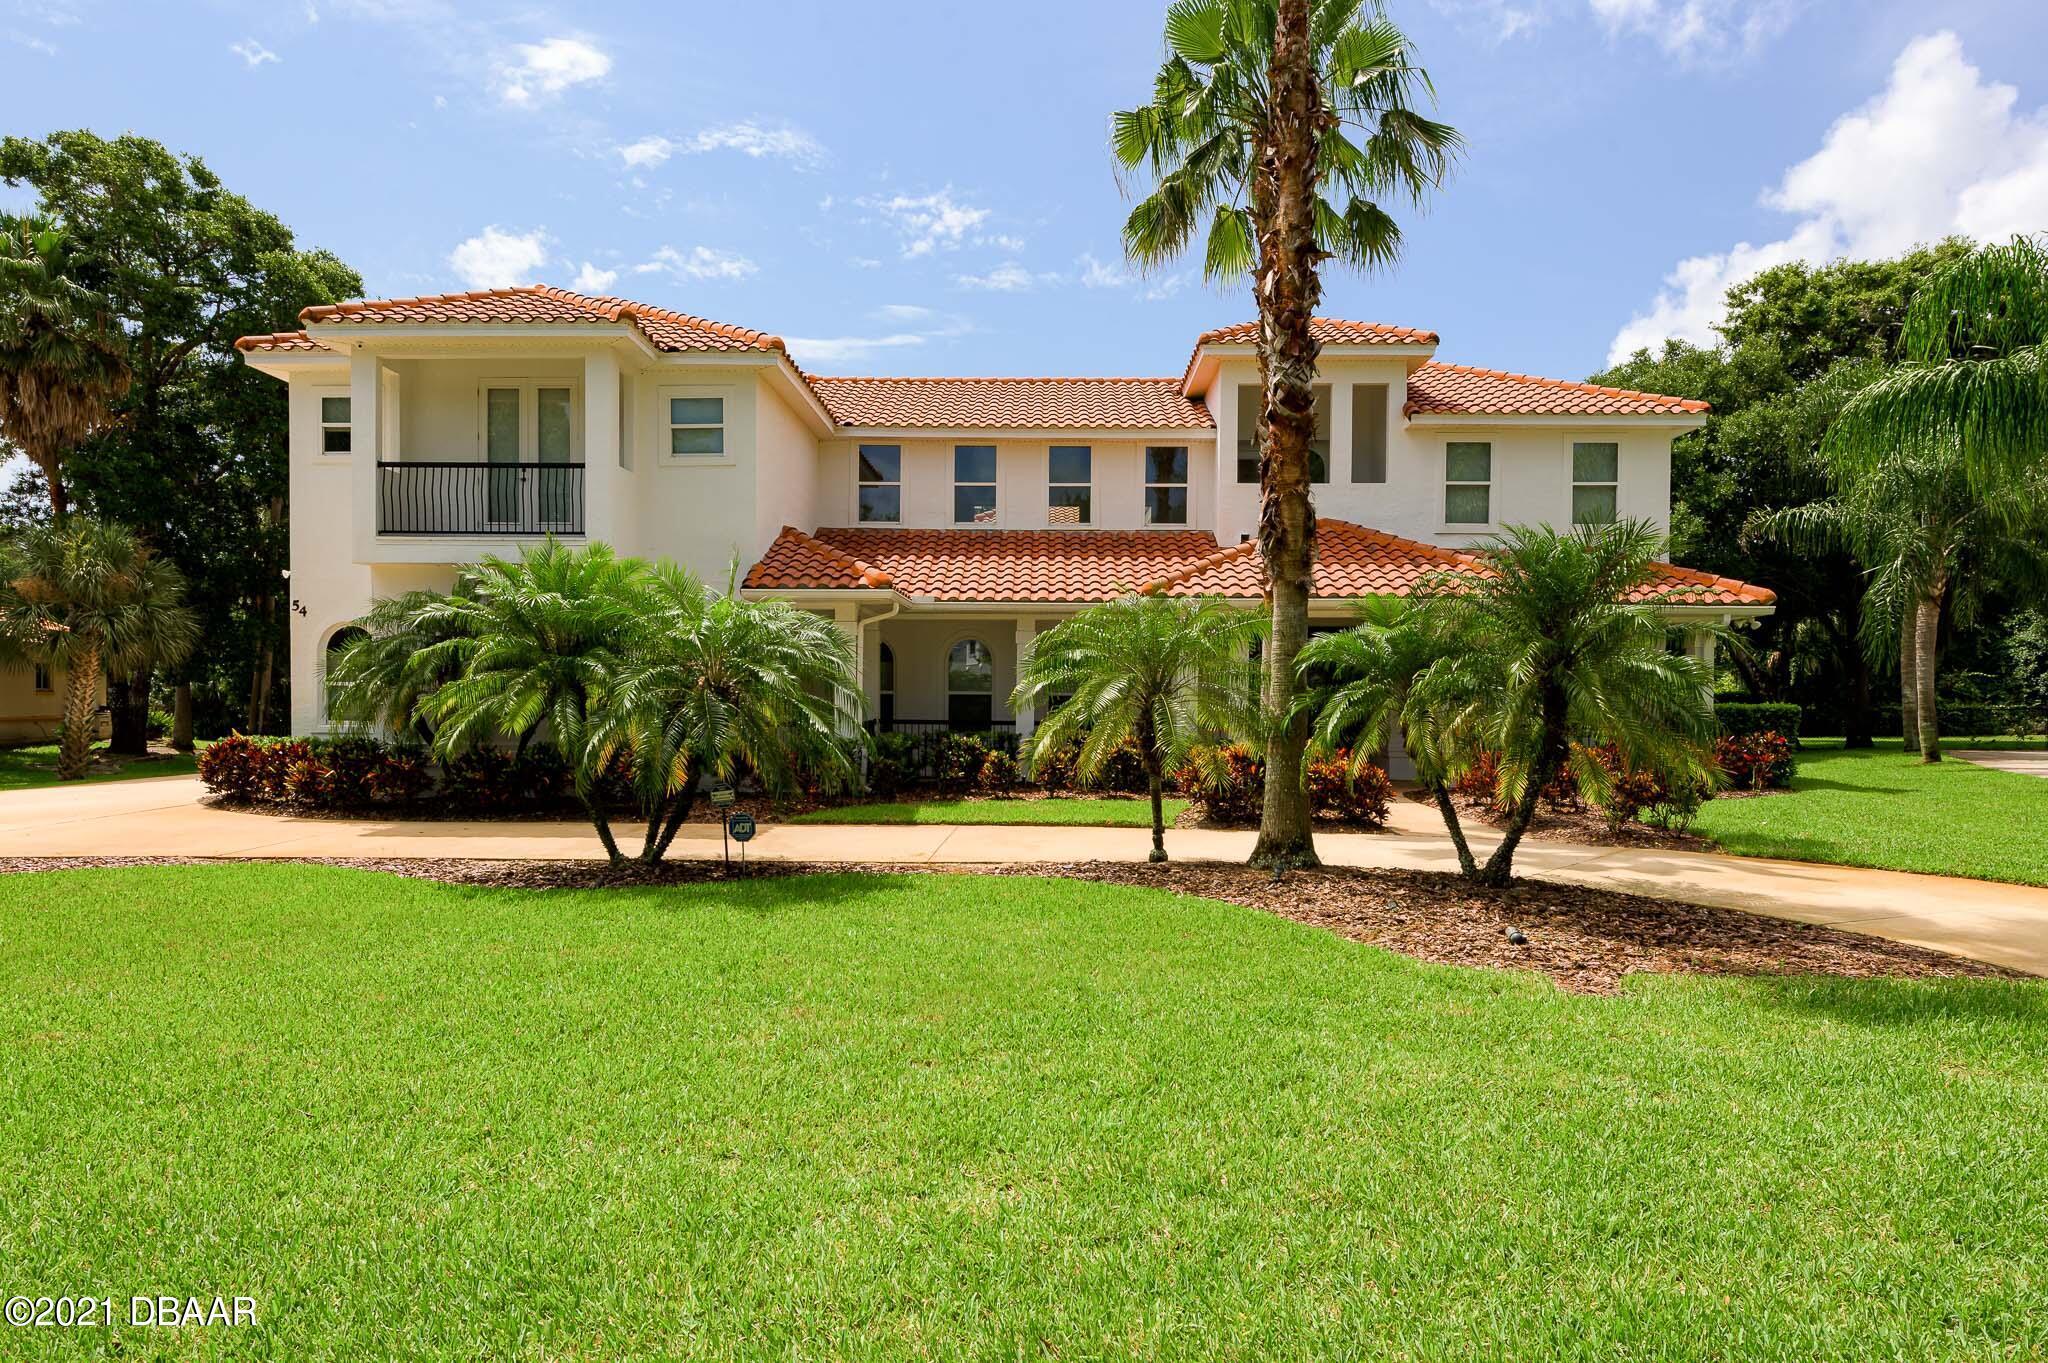 Photo of 54 Emerald Oaks Lane, Ormond Beach, FL 32174